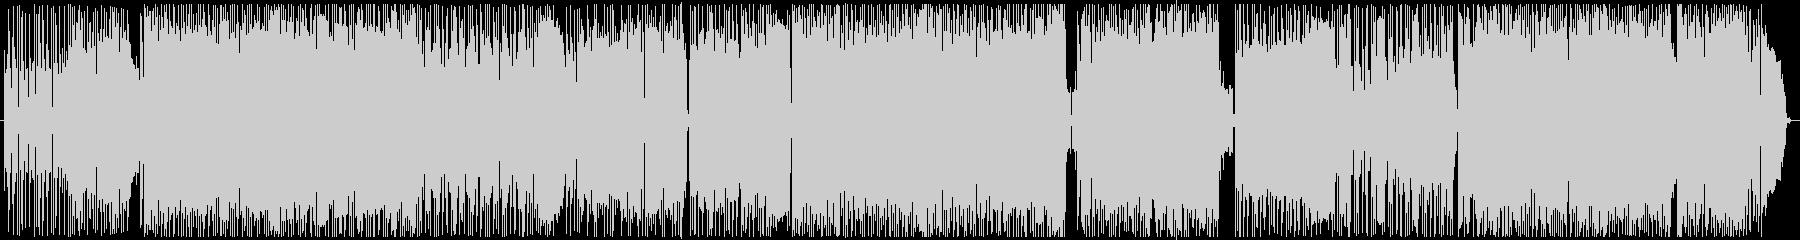 RADIPHONEの未再生の波形